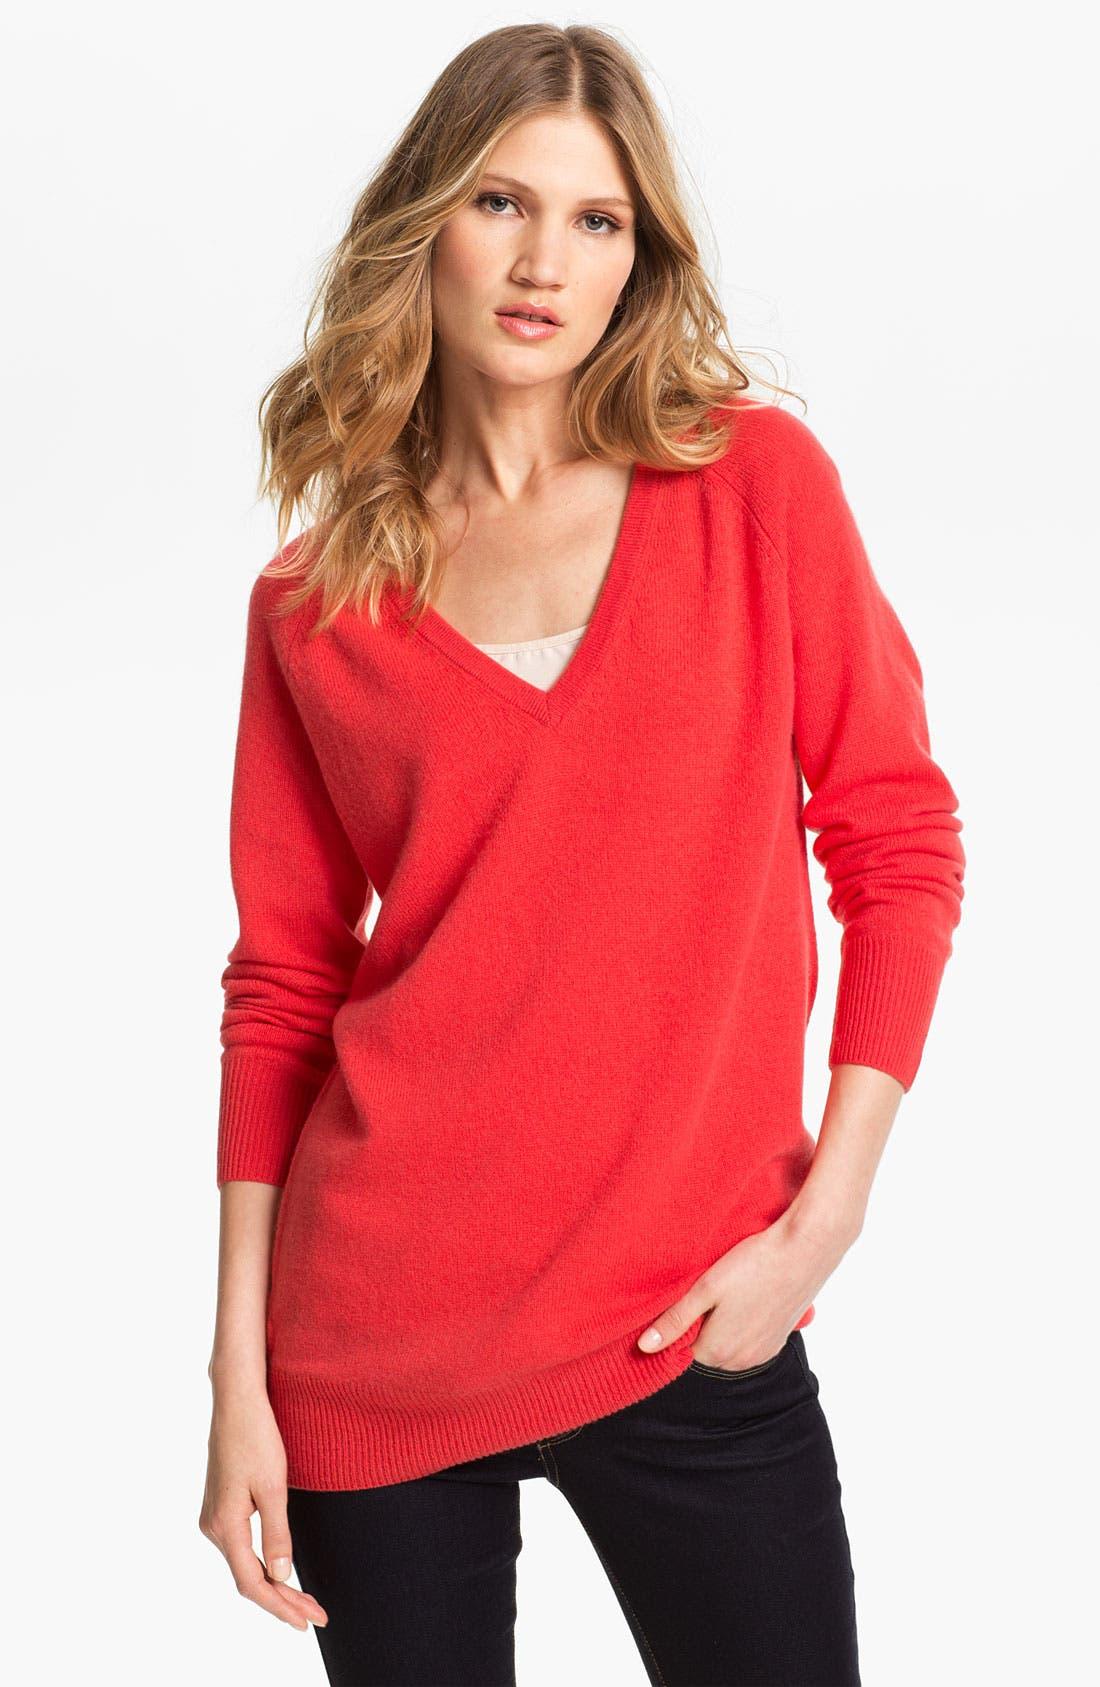 Main Image - Equipment 'Asher' V-Neck Cashmere Sweater